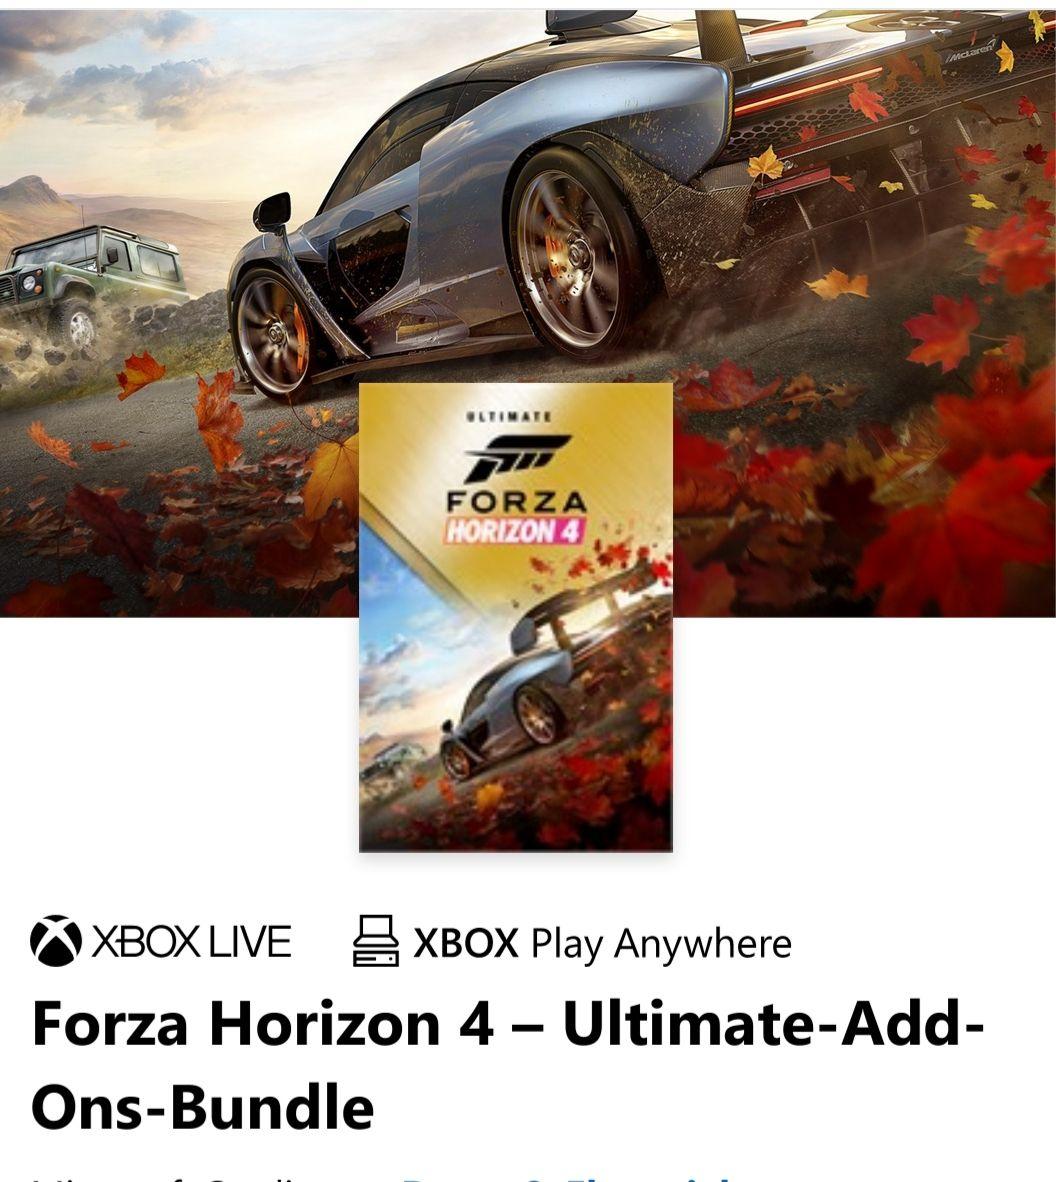 Forza Horizon 4 – Ultimate-Add-Ons-Bundle mit Gold